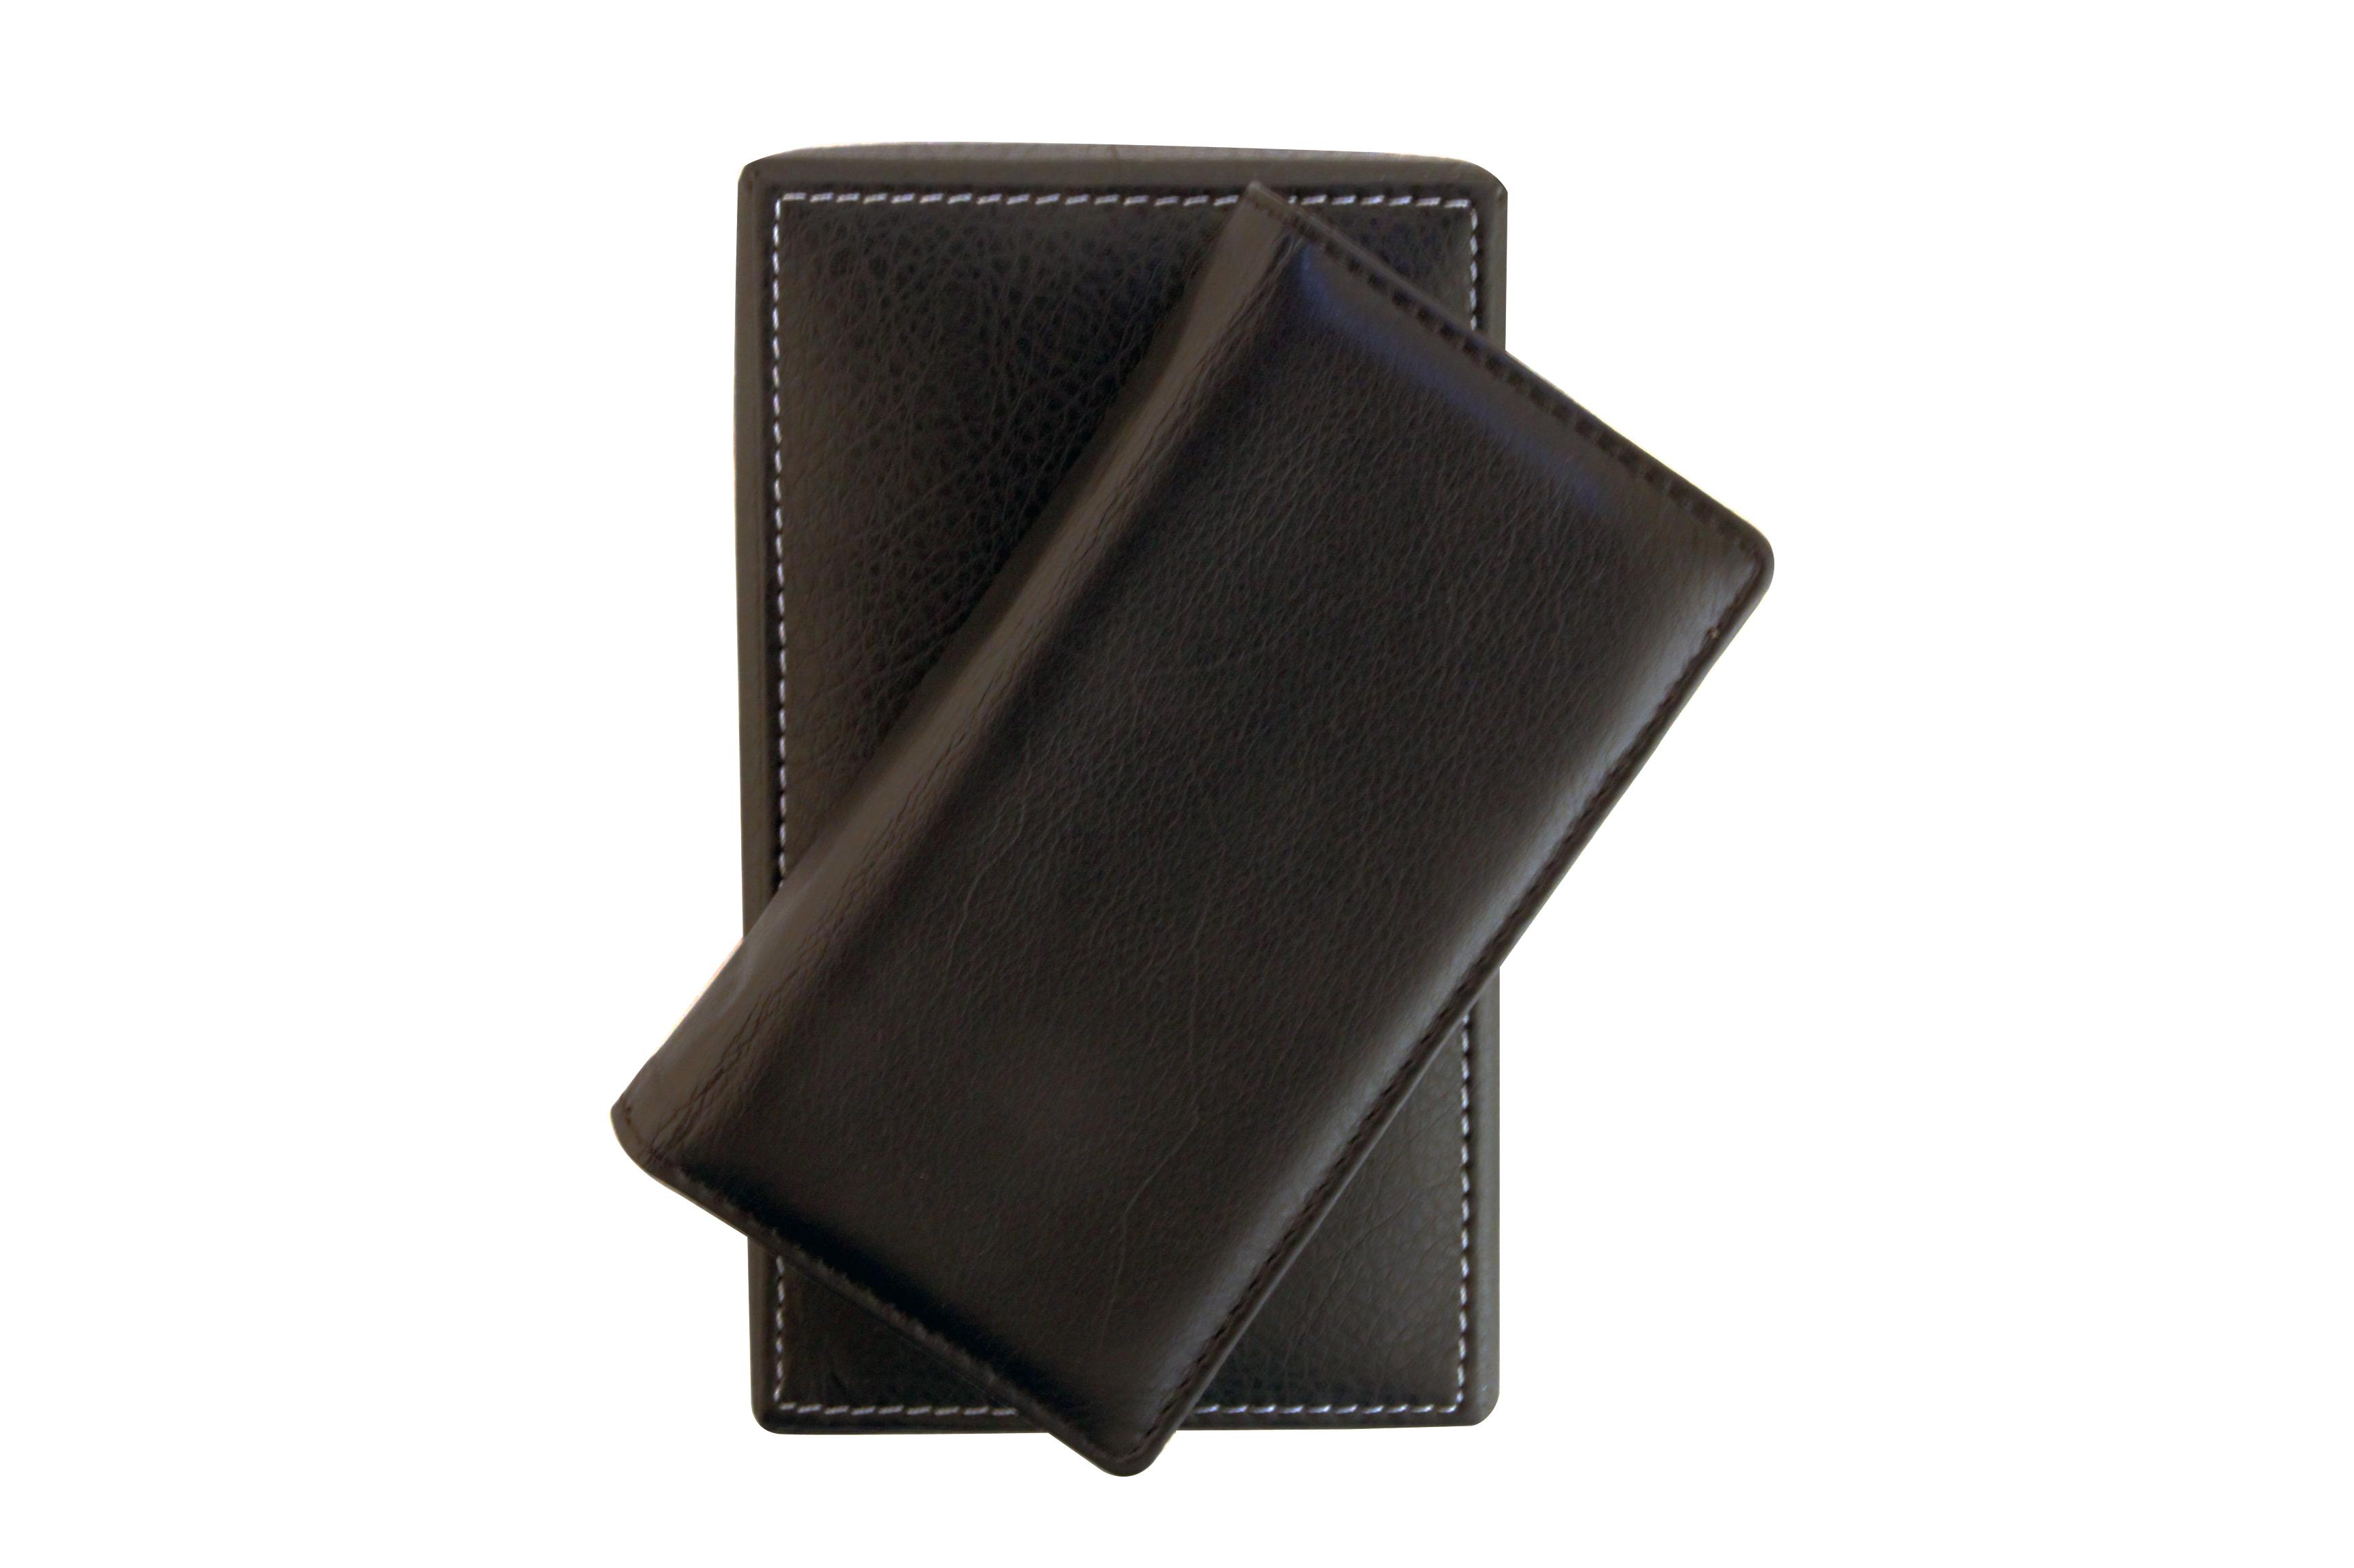 Coque iphone porte cartes anti fraude peter fleming - Coque porte carte iphone se ...